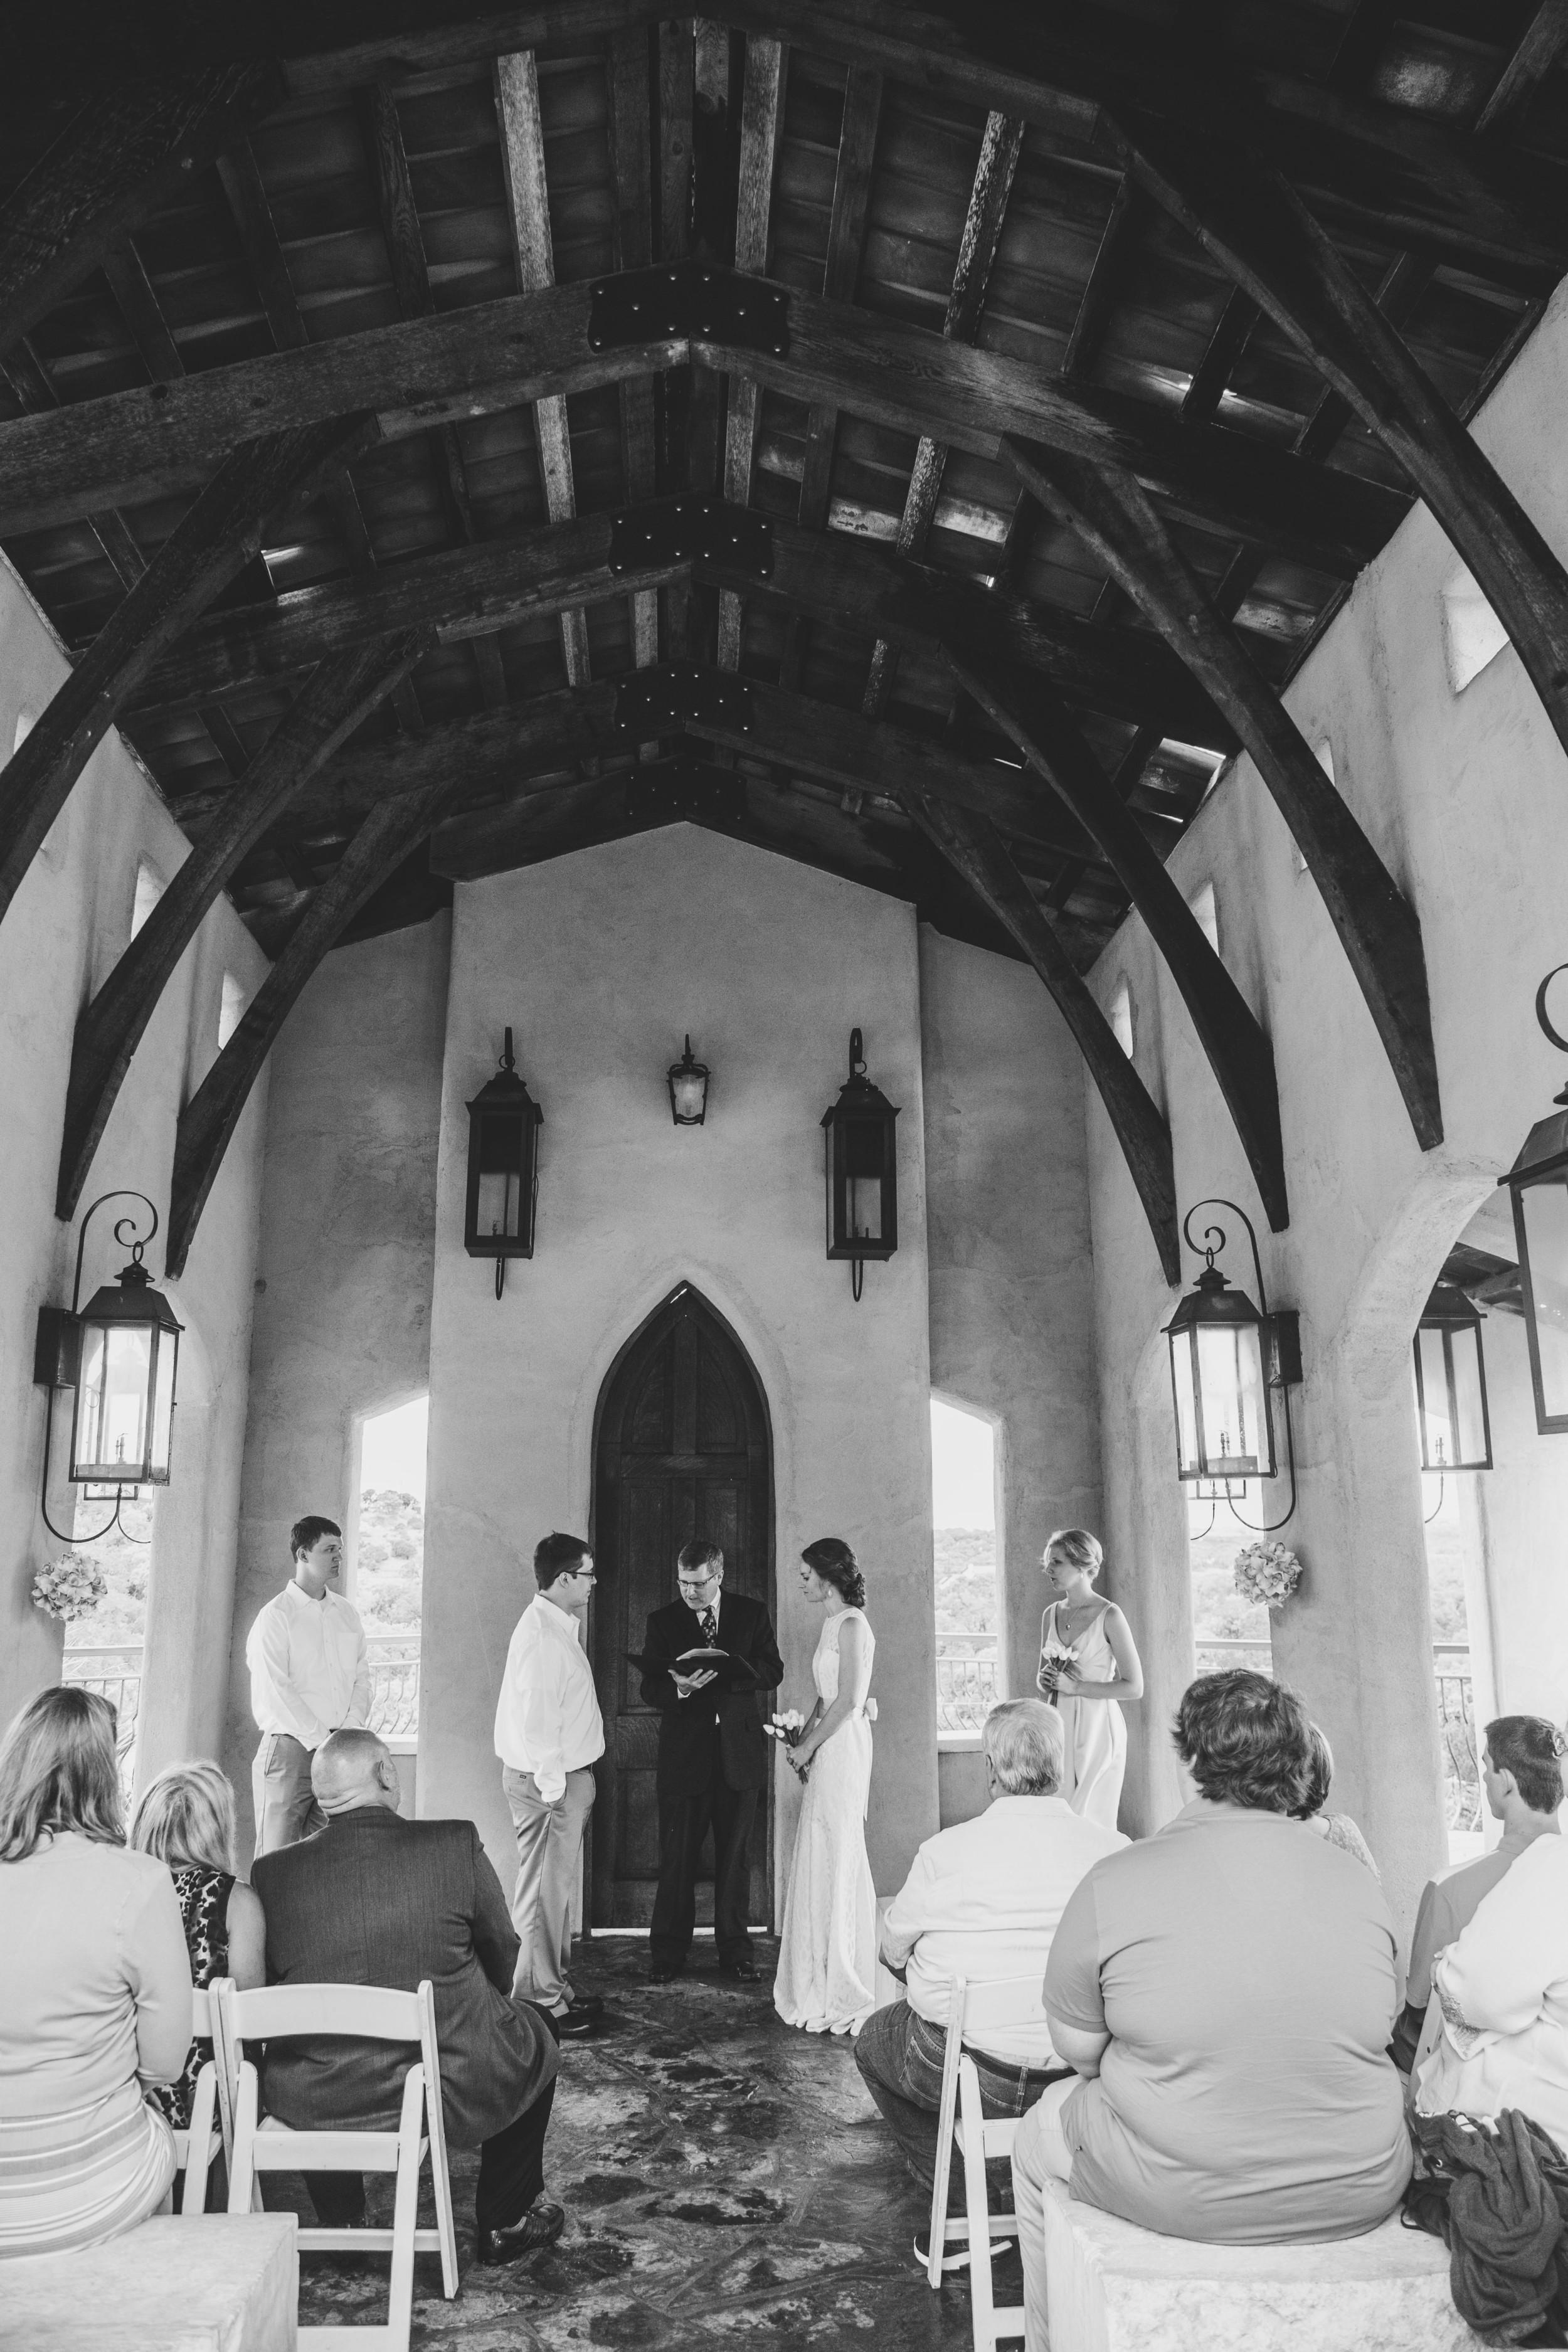 ATGI_Nicole & Patrick Wedding_2016_2S8A6453.jpg